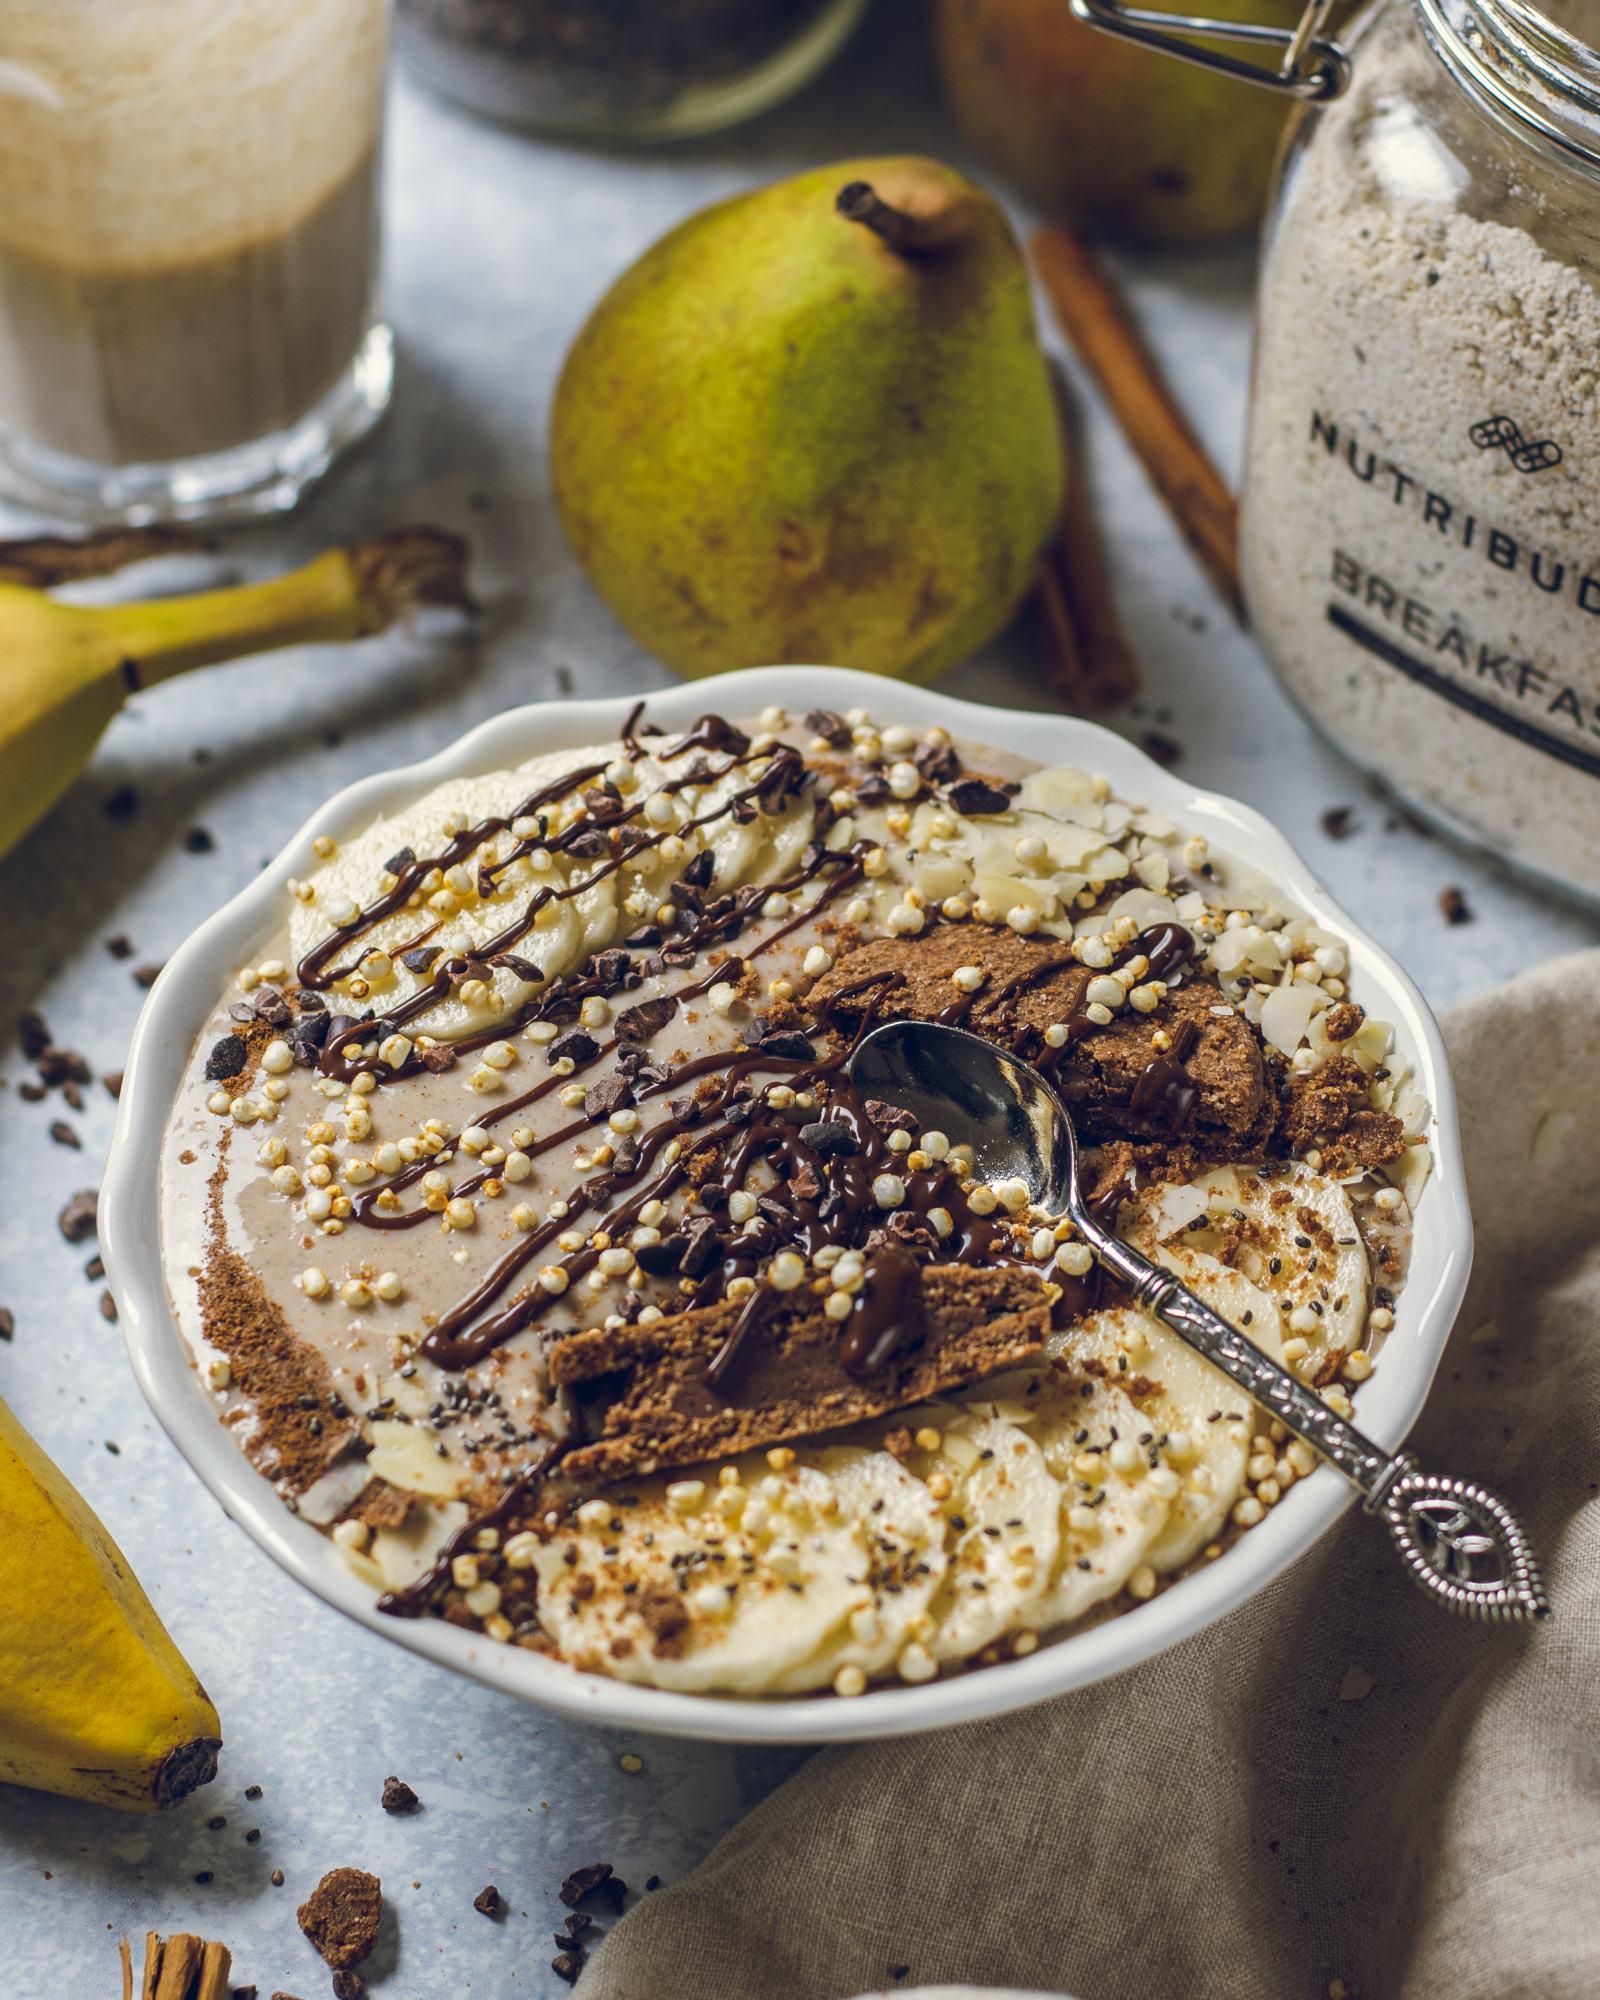 Cinnamon Pear Breakfast Smoothie